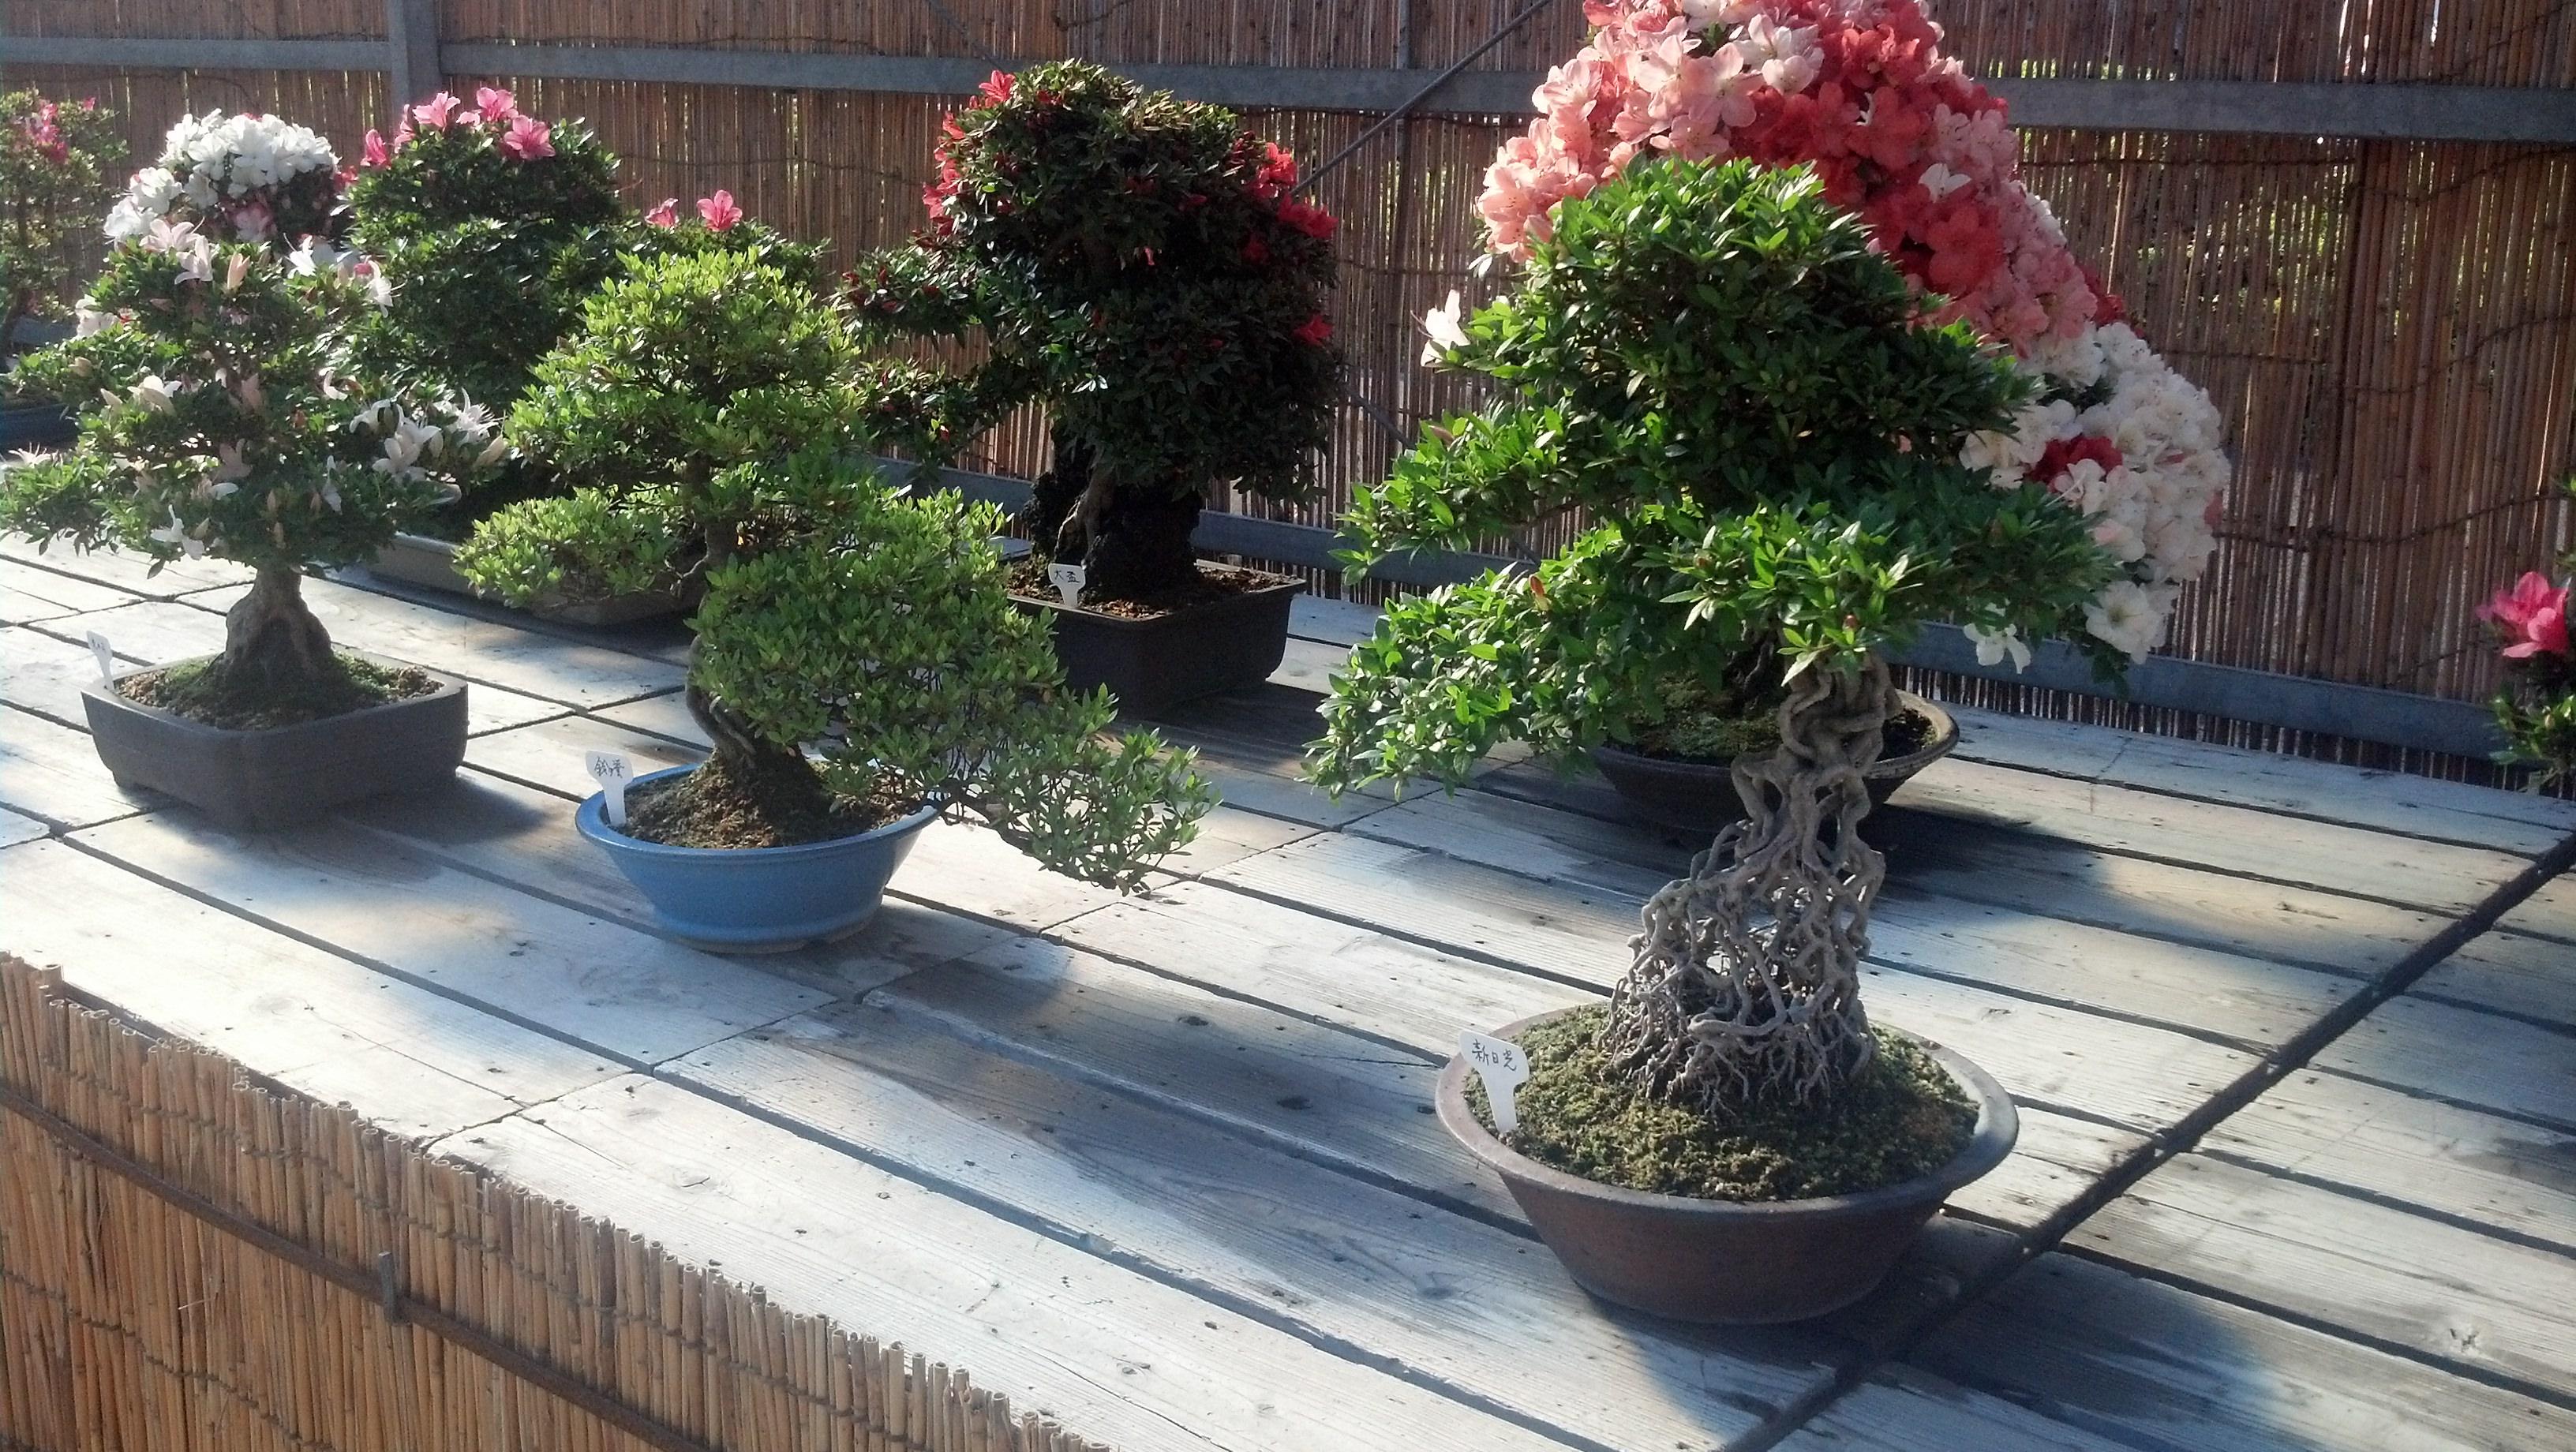 There were many bonsai on display near Nagoya Castle. I love bonsai!